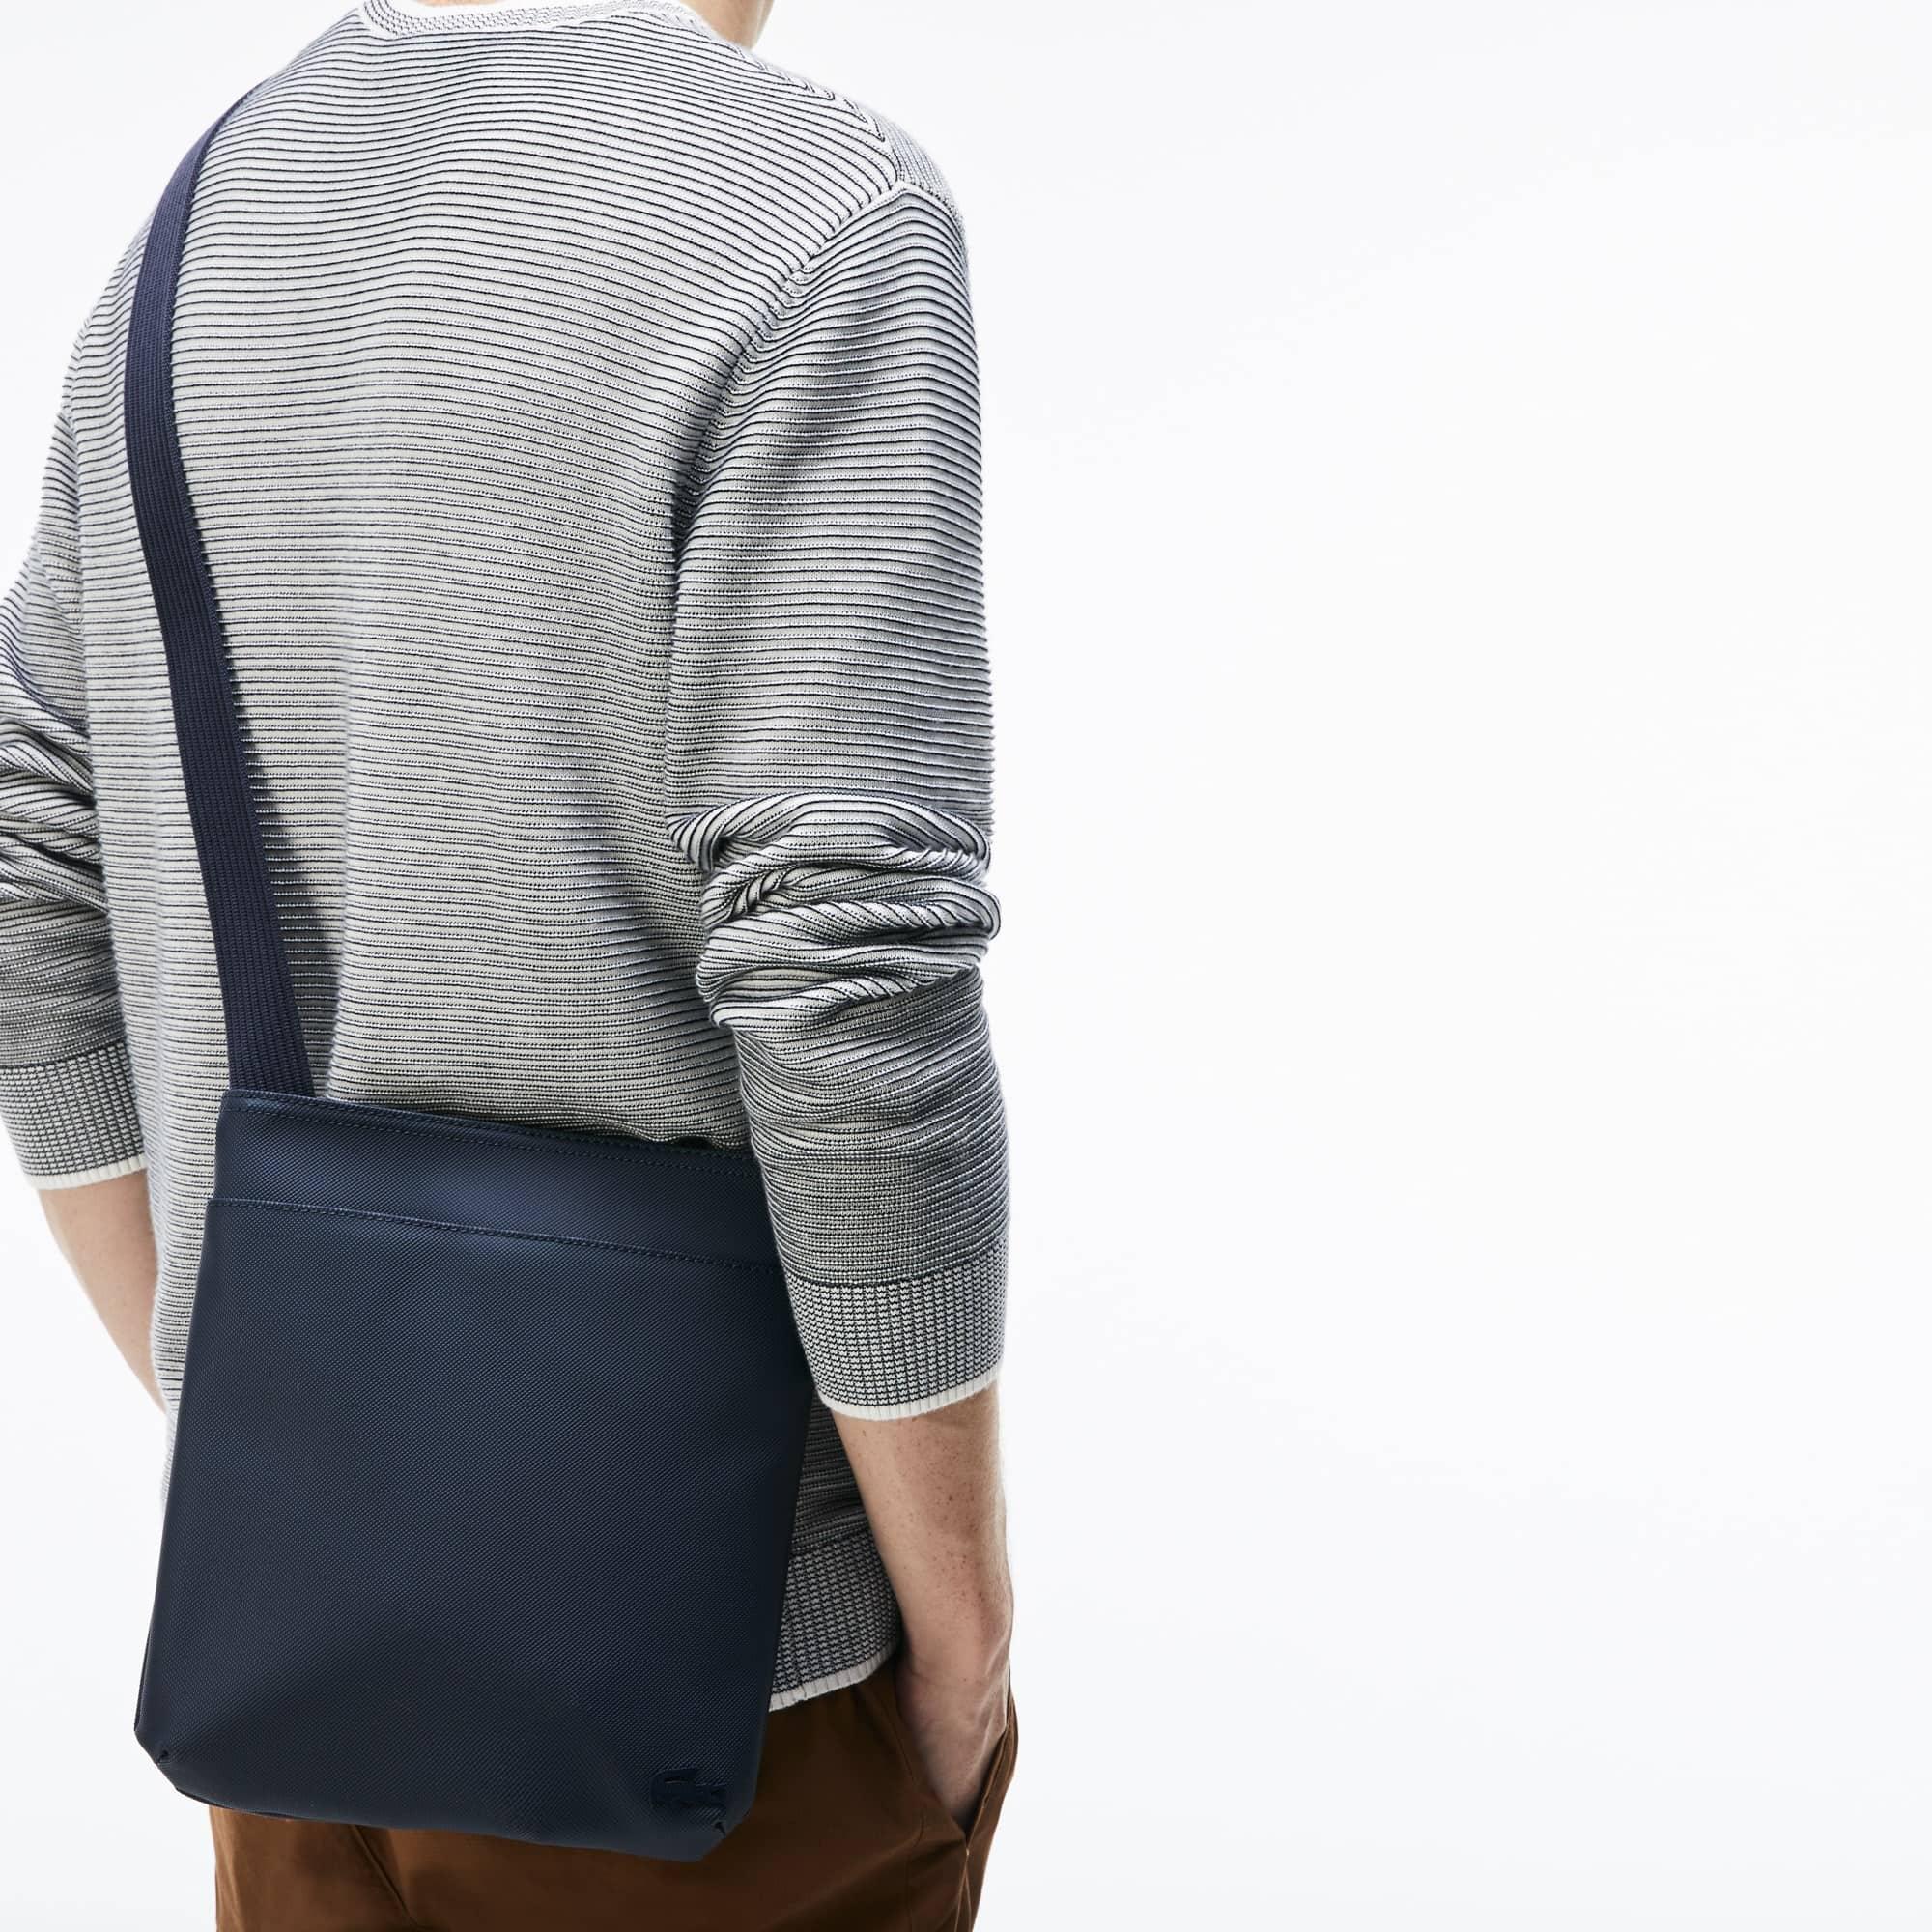 Lacoste - Flache Herren-Tasche CLASSIC aus Petit Piqué - 5